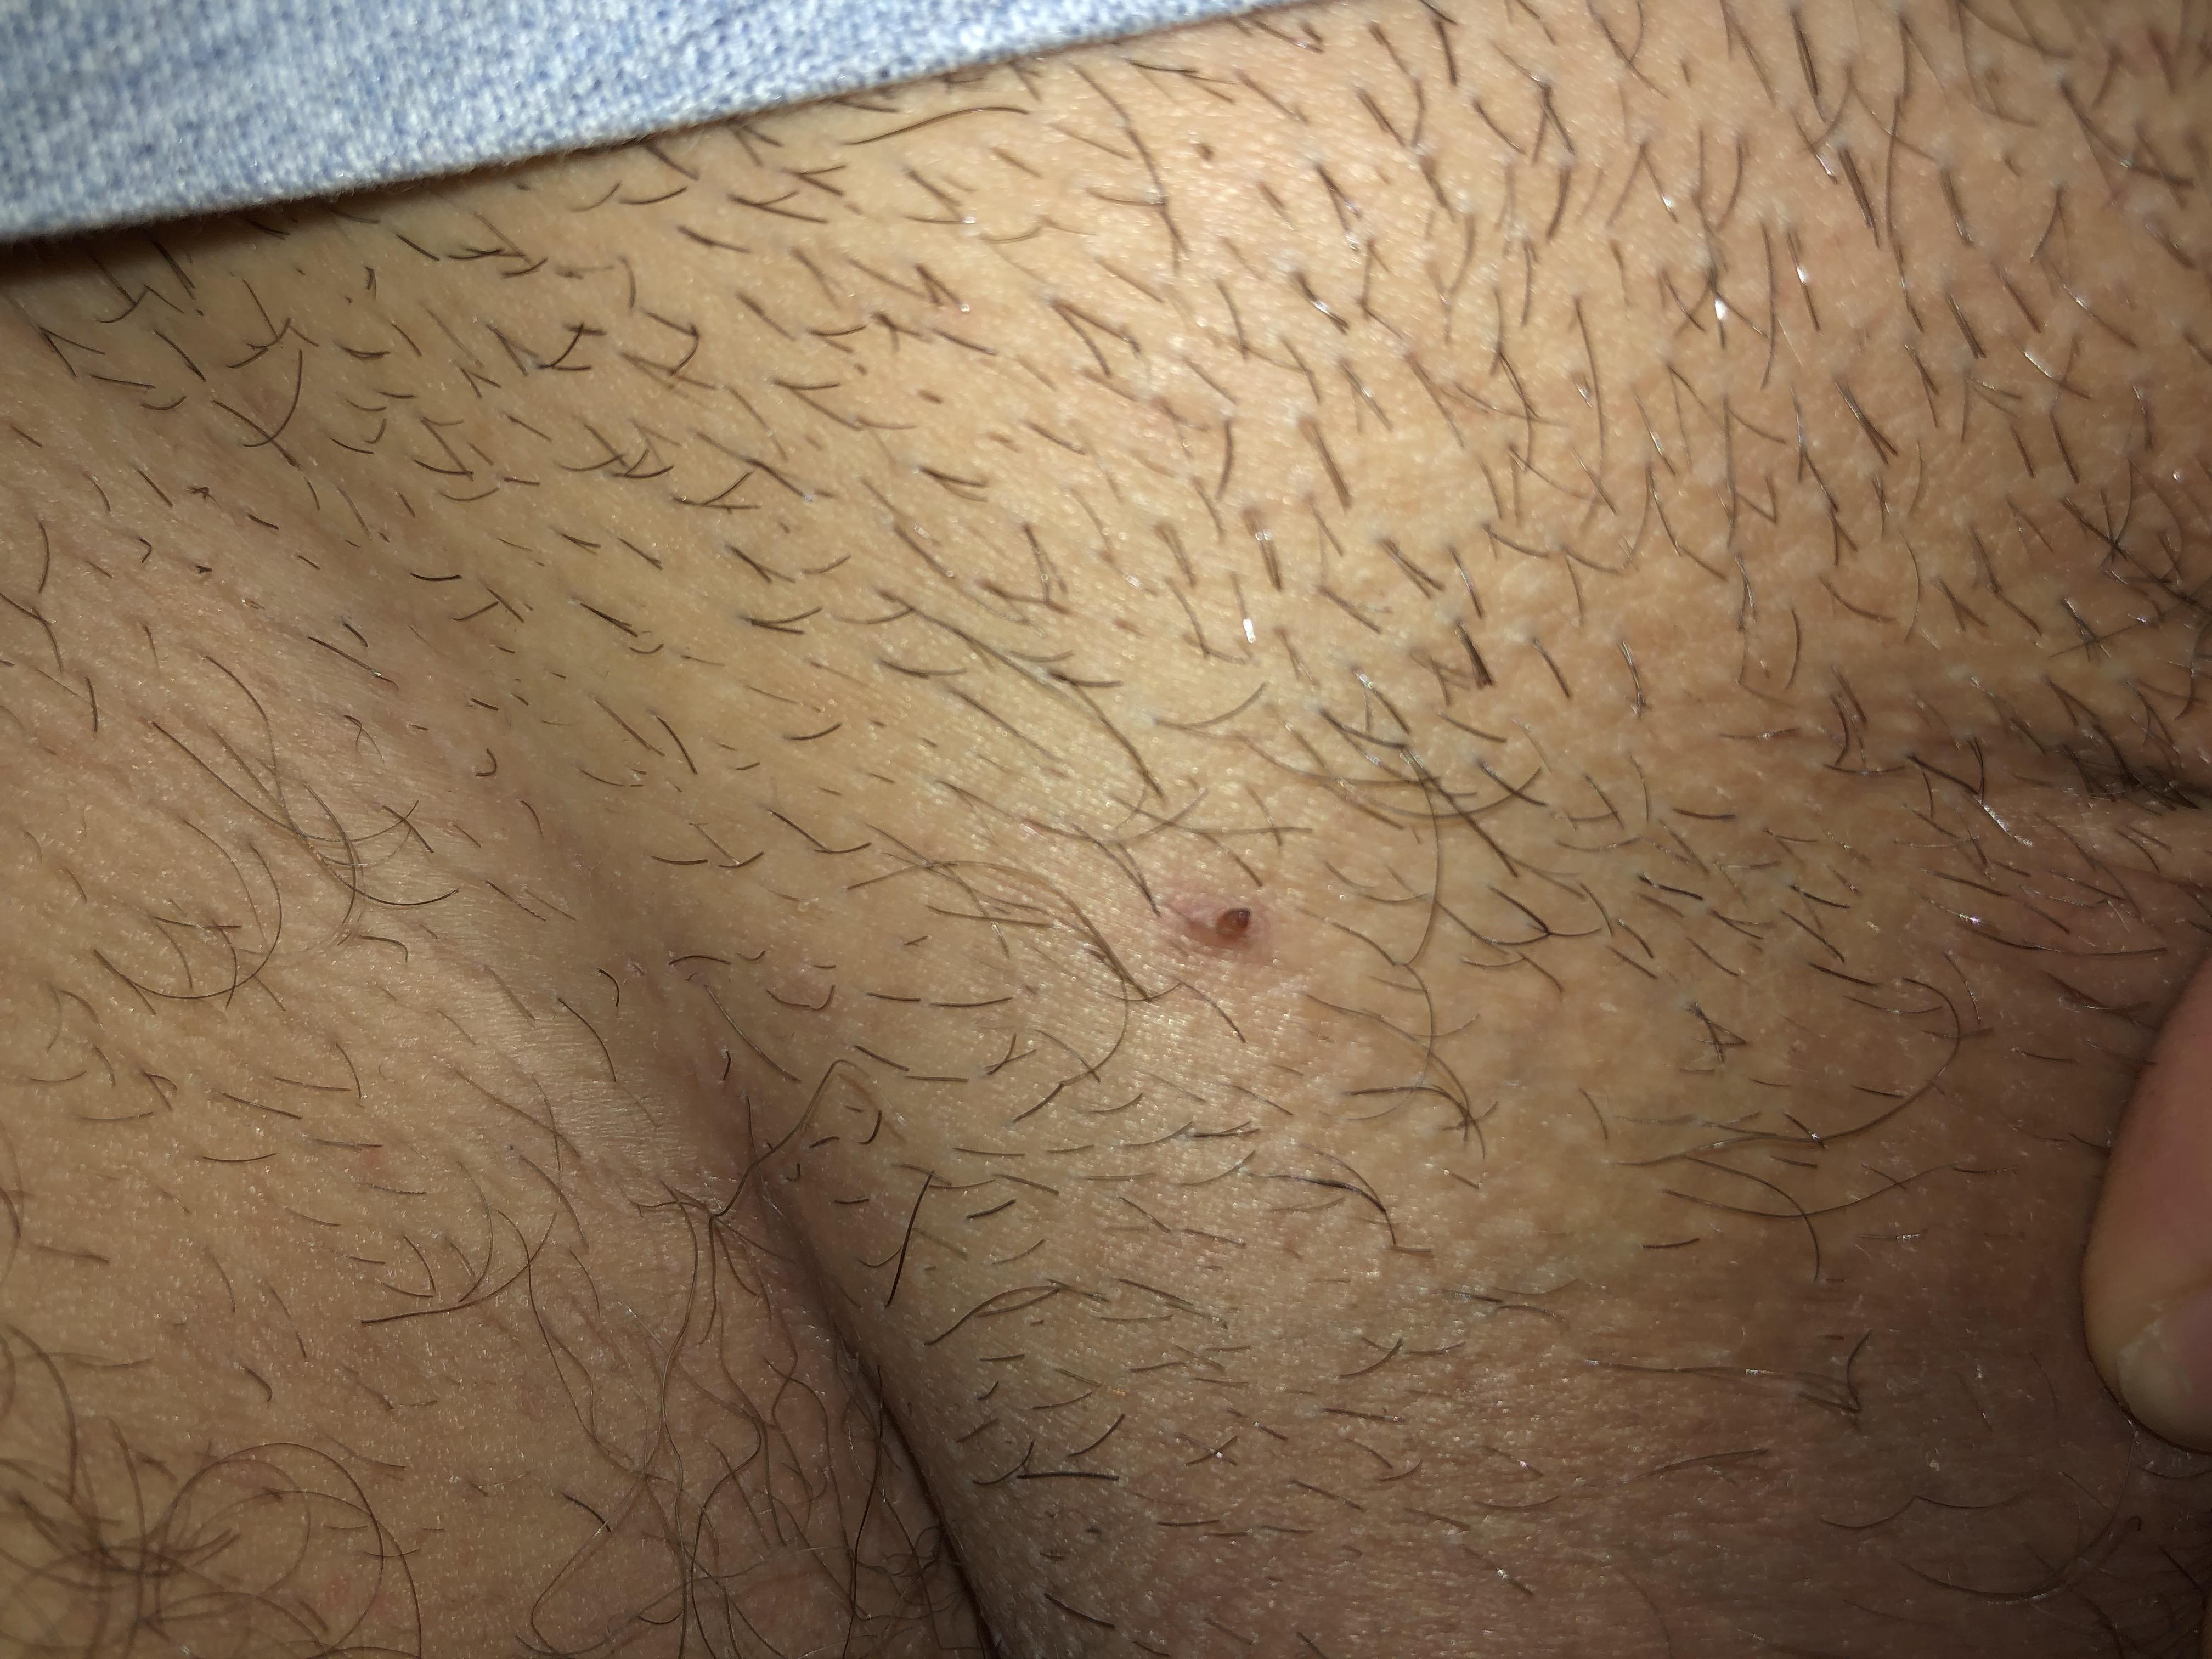 Condyloma acuminatum on thigh